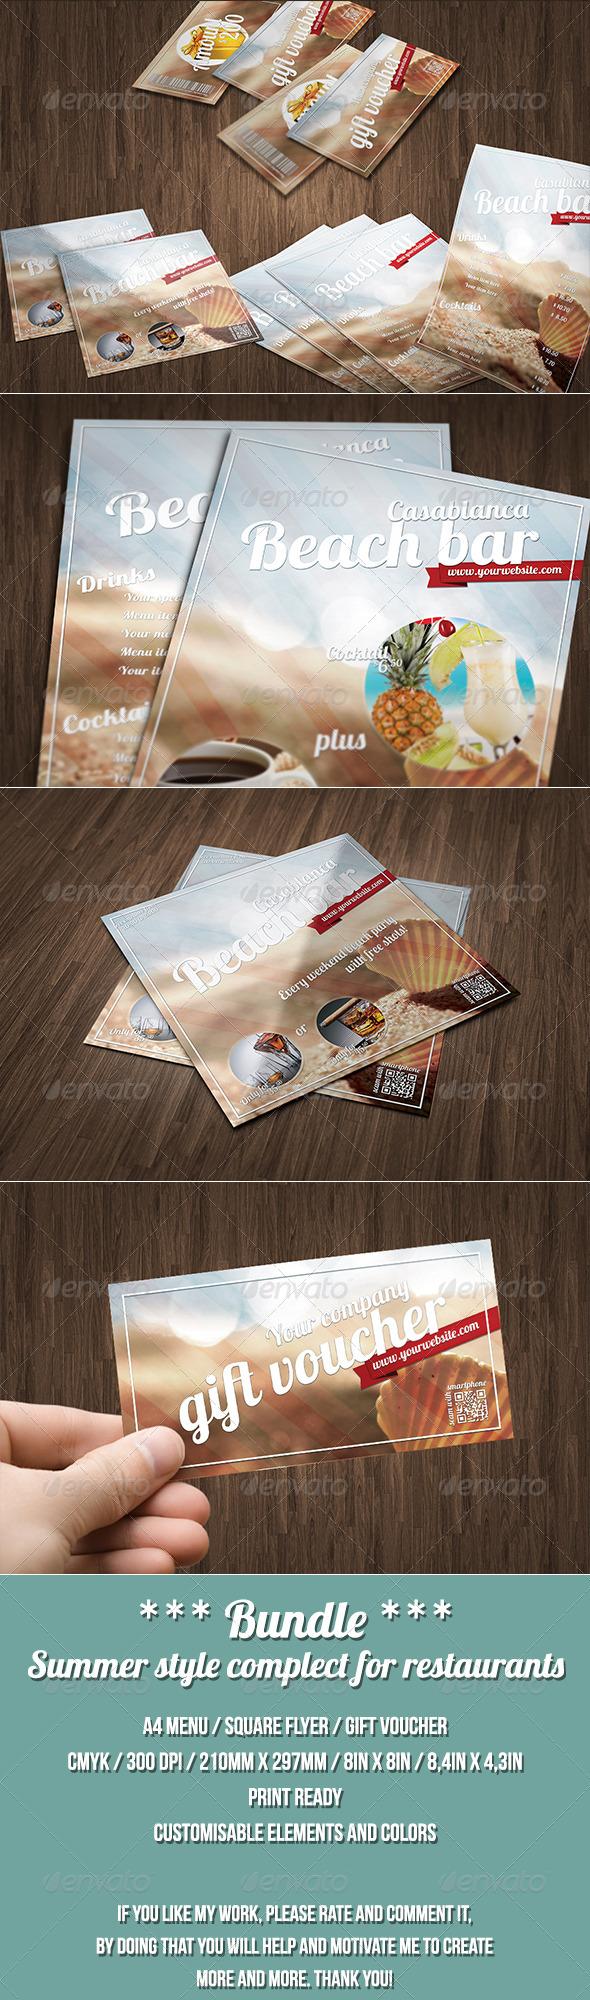 GraphicRiver Restaurant or bar BUNDLE summer style 7580628